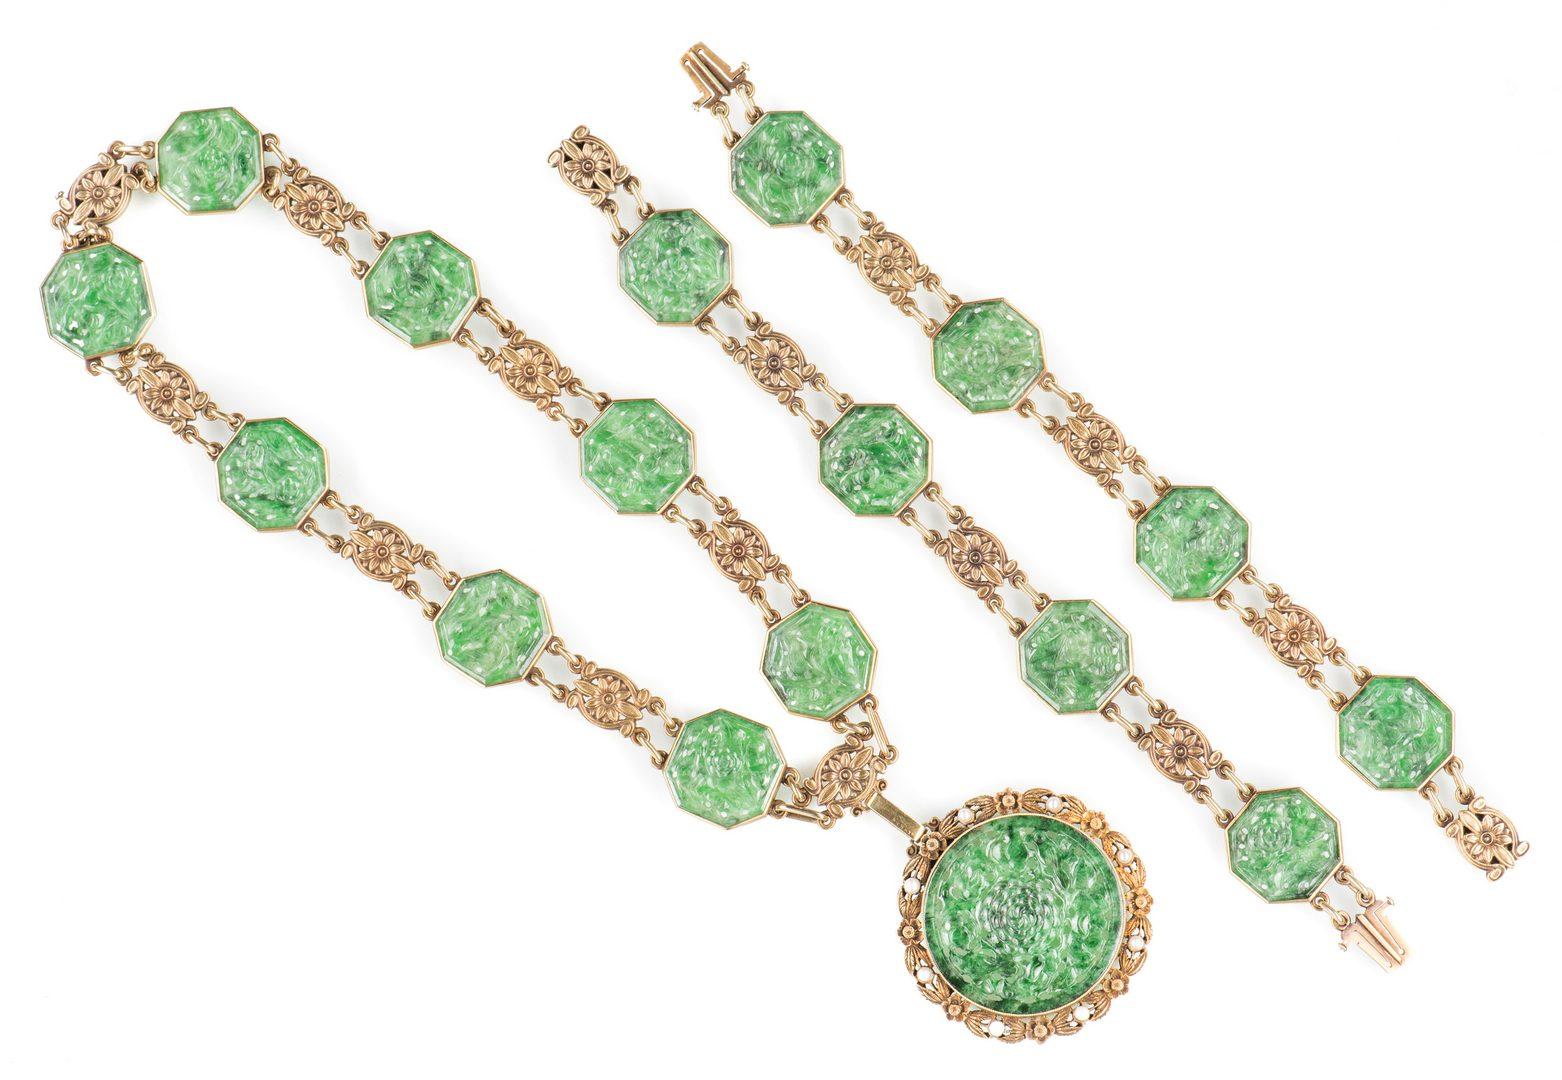 Lot 48: Tiffany Jade Pendant, Gold Demi Parure